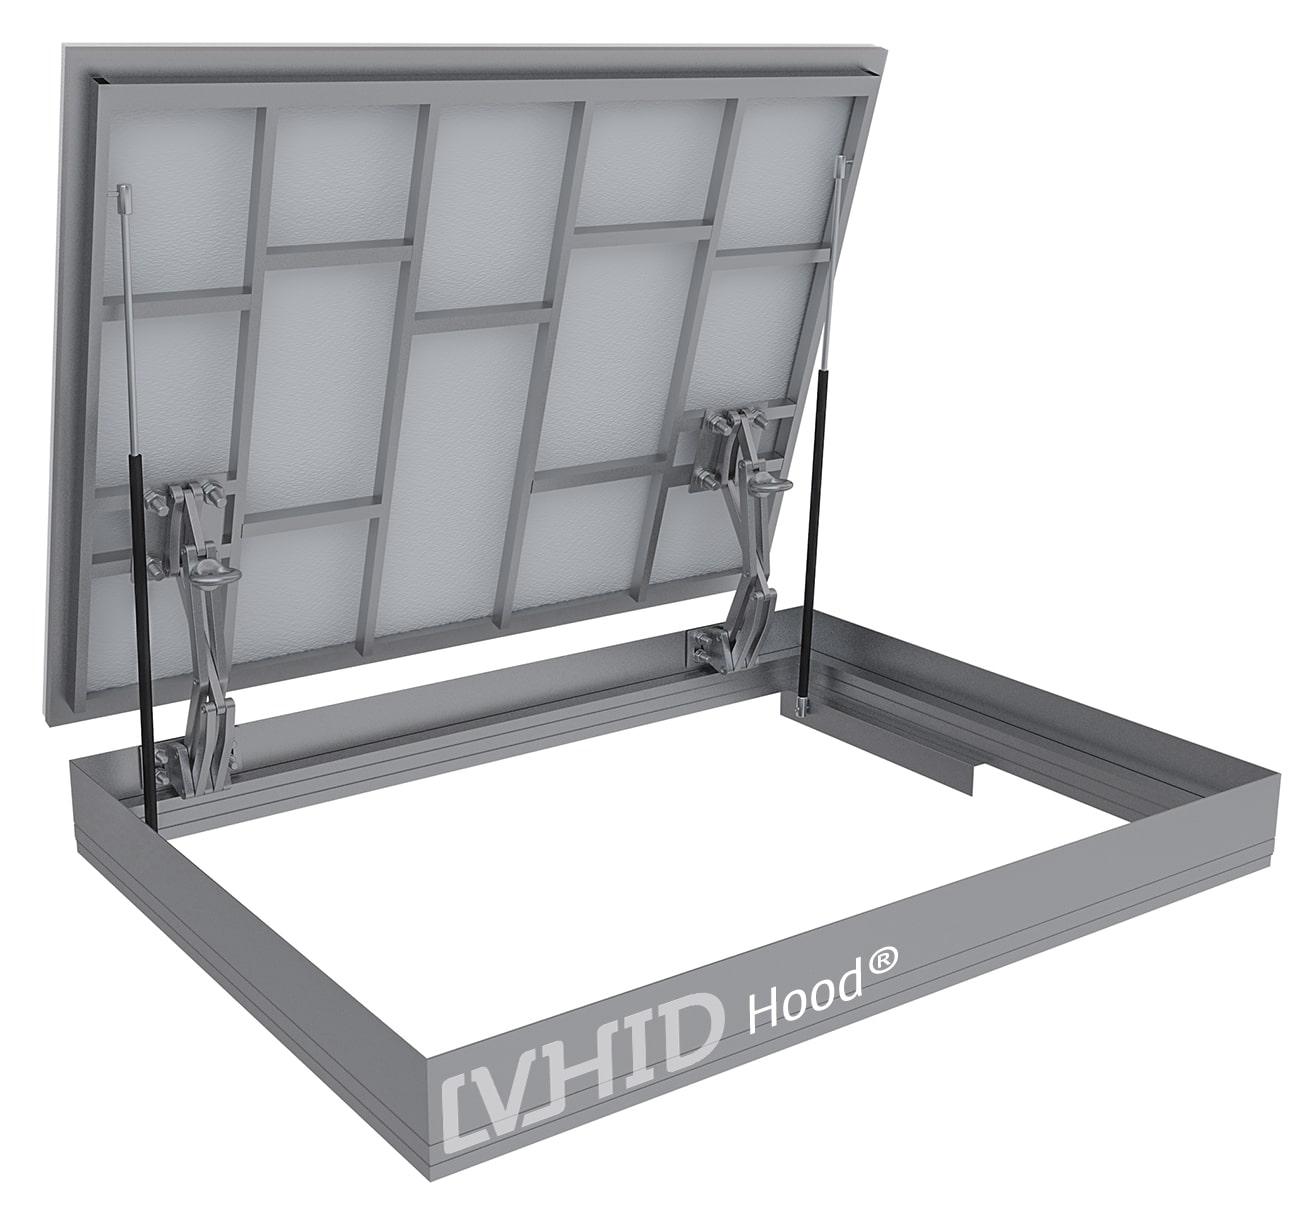 Hood-vhid-2021